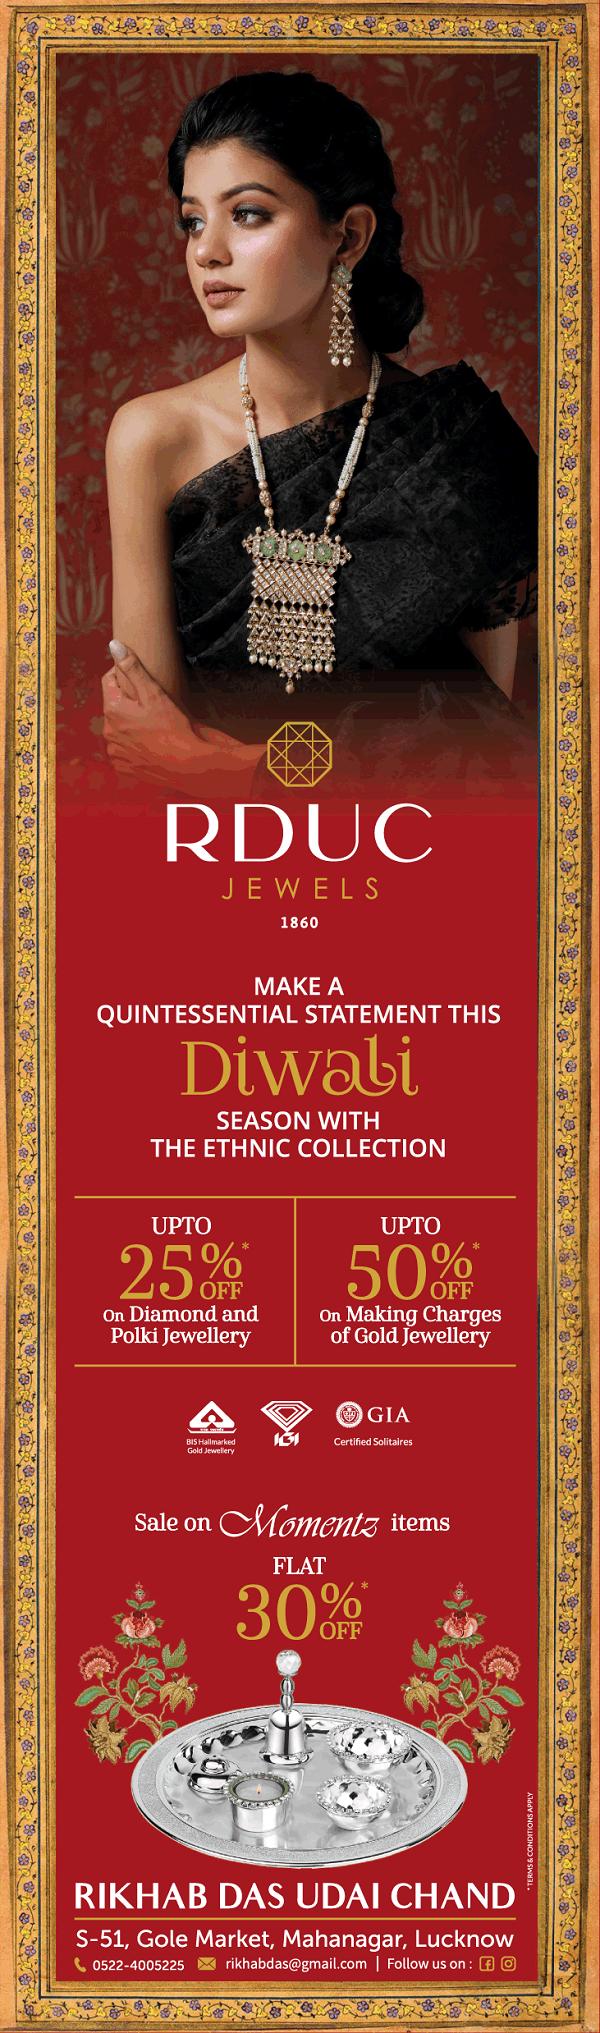 Rikhab Das Udai Chand offers India